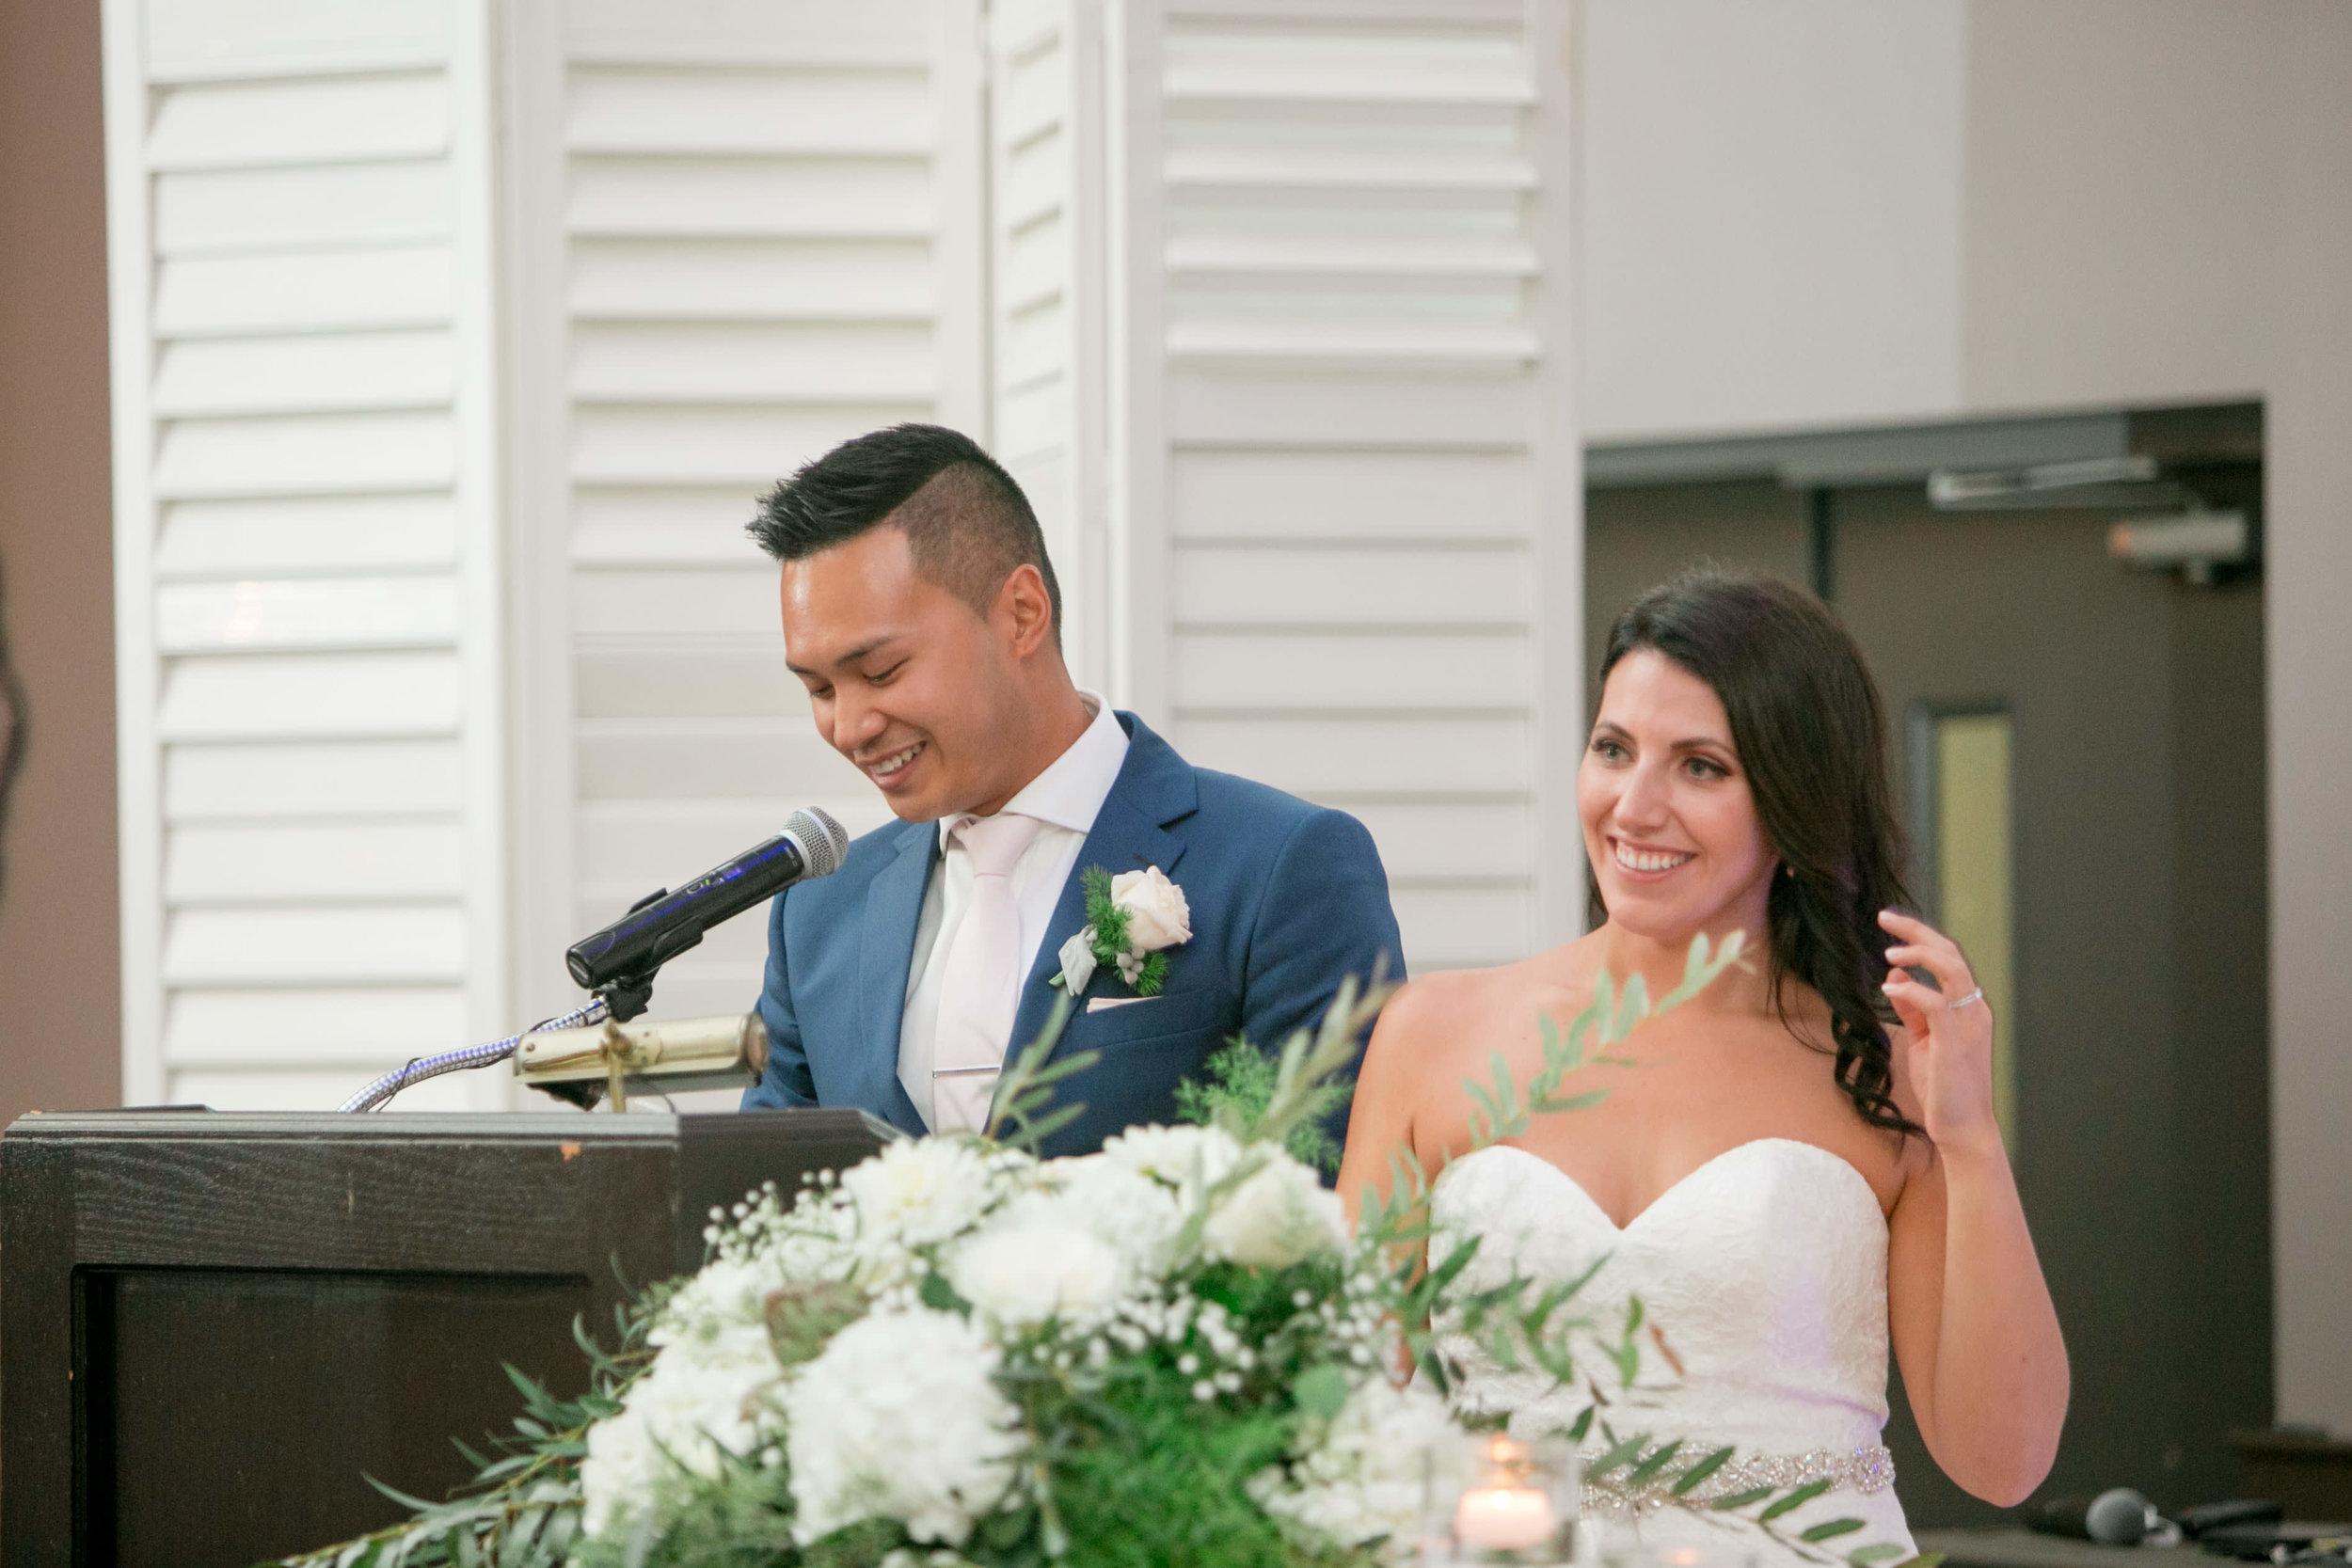 Stefanie___Bernard___Daniel_Ricci_Weddings_High_Res._Finals__653.jpg